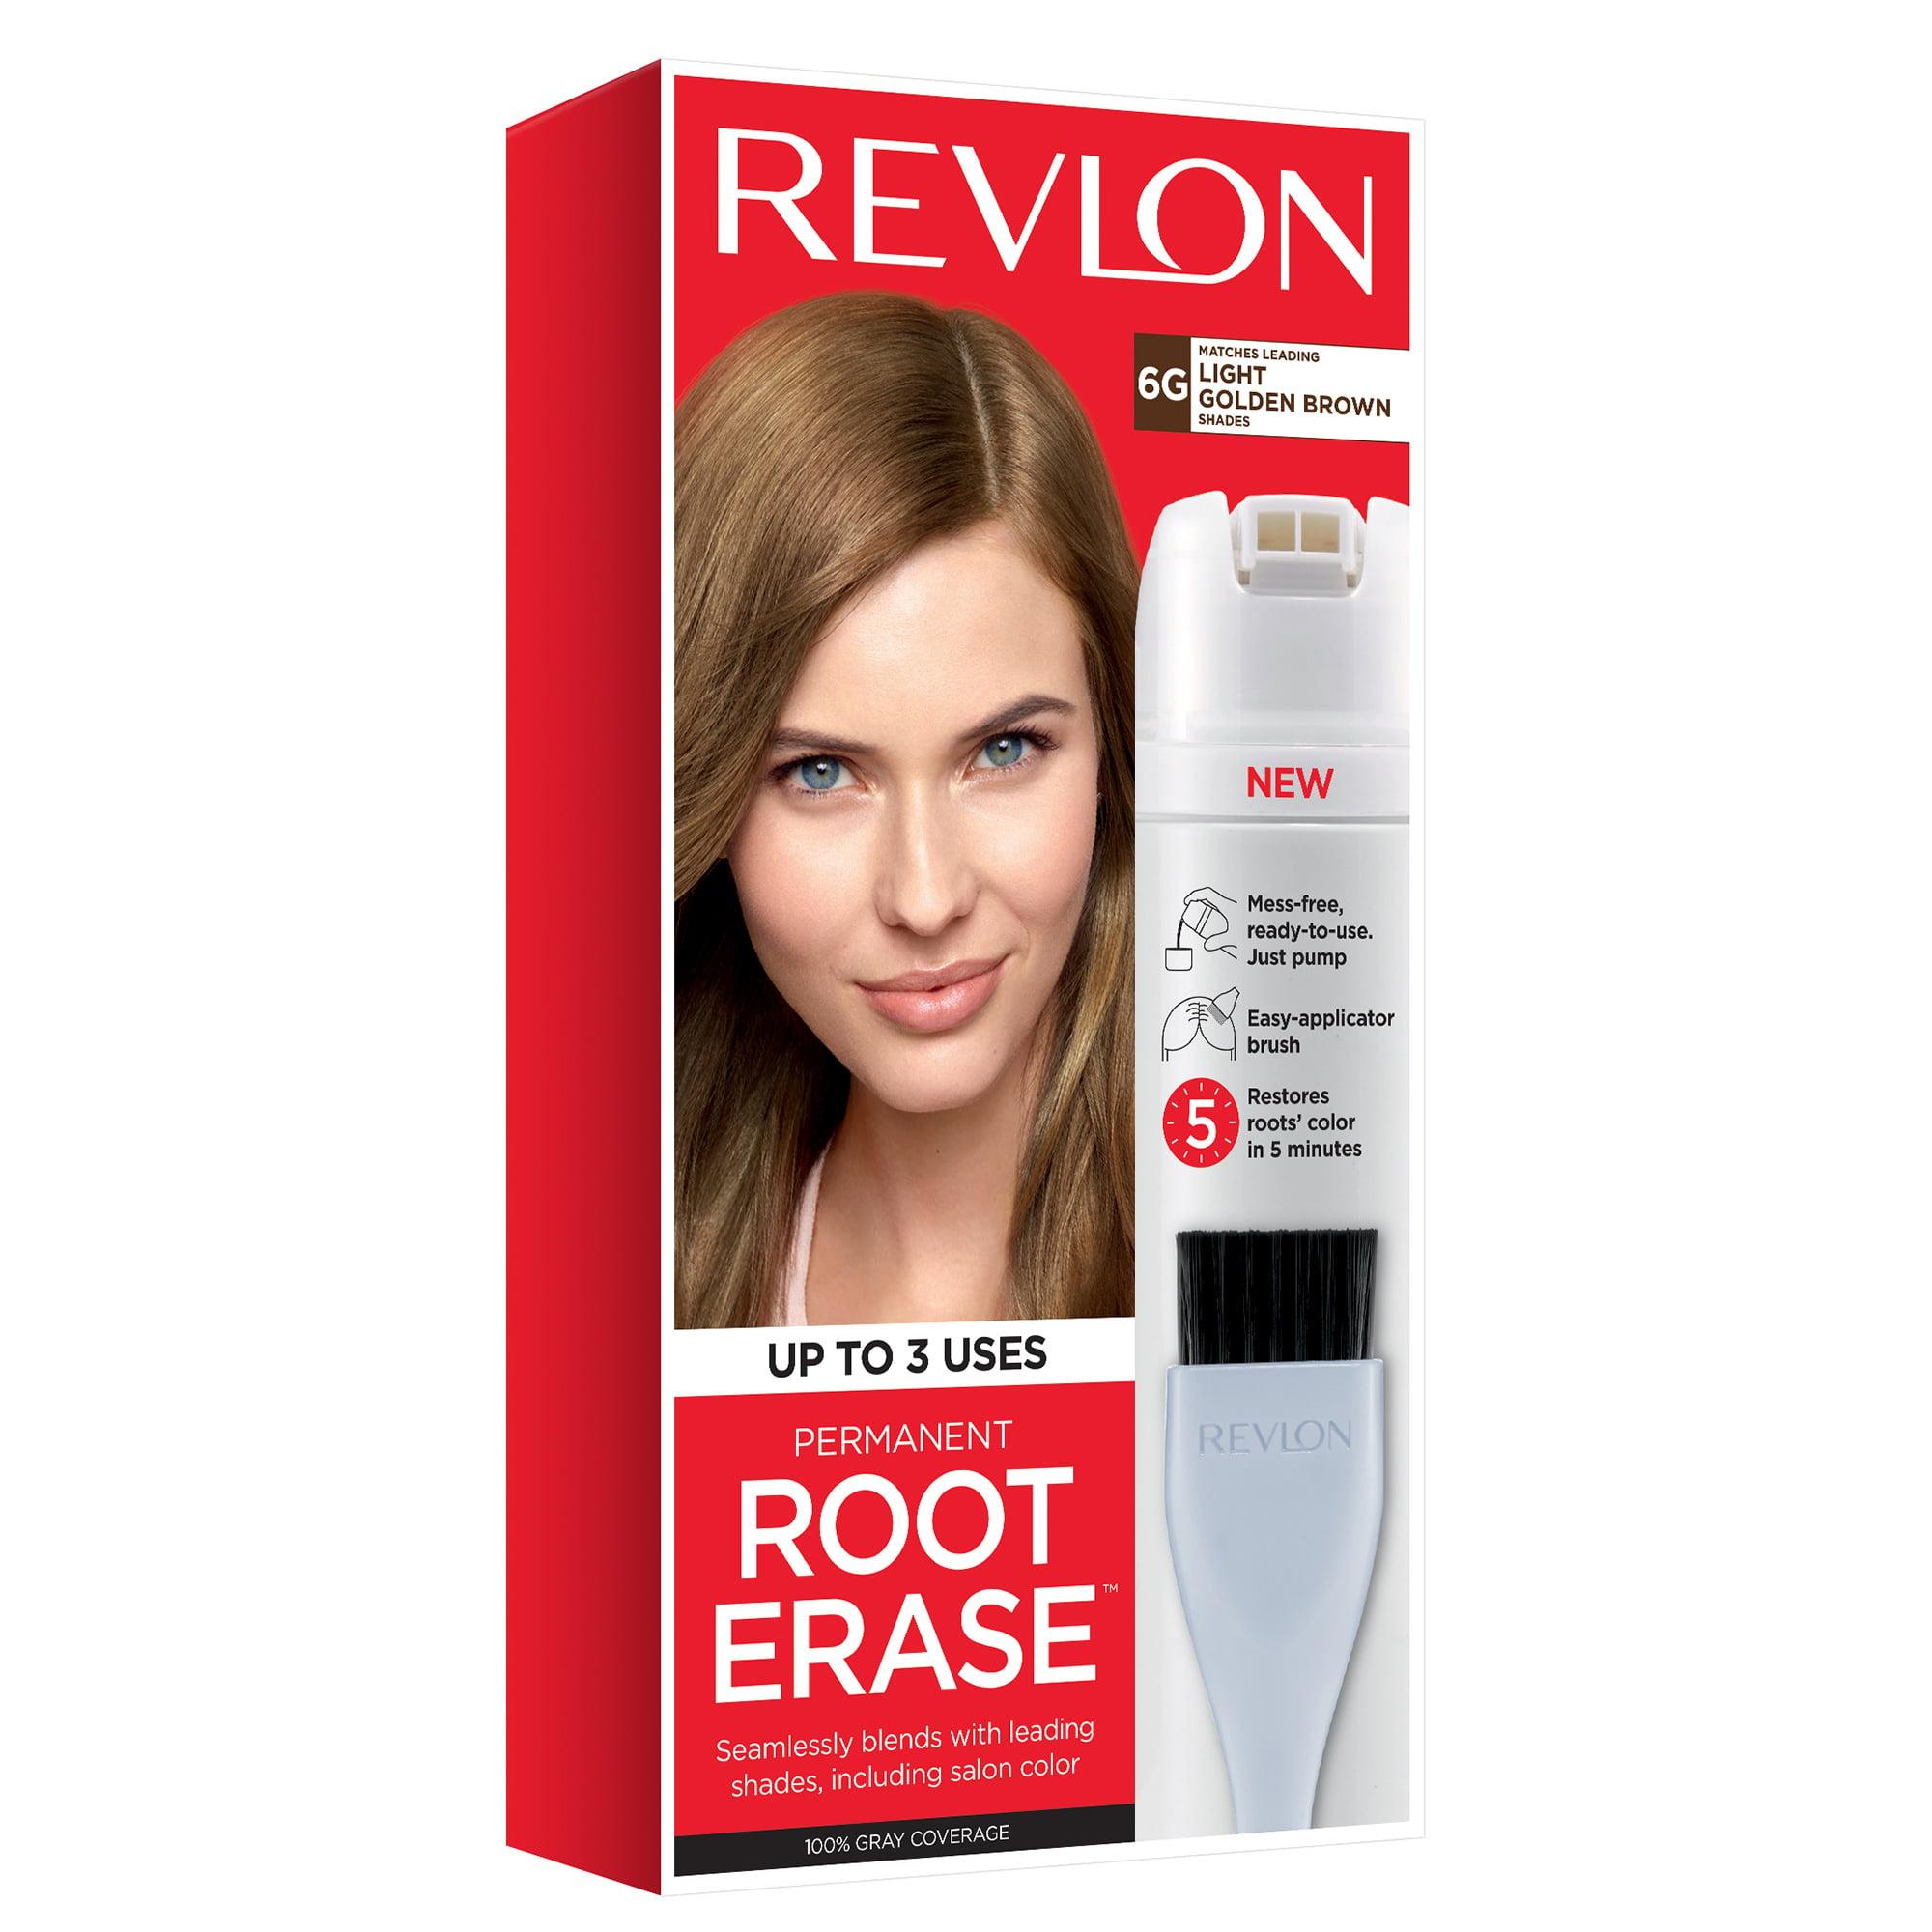 Revlon Root Erase Hair Color, Black